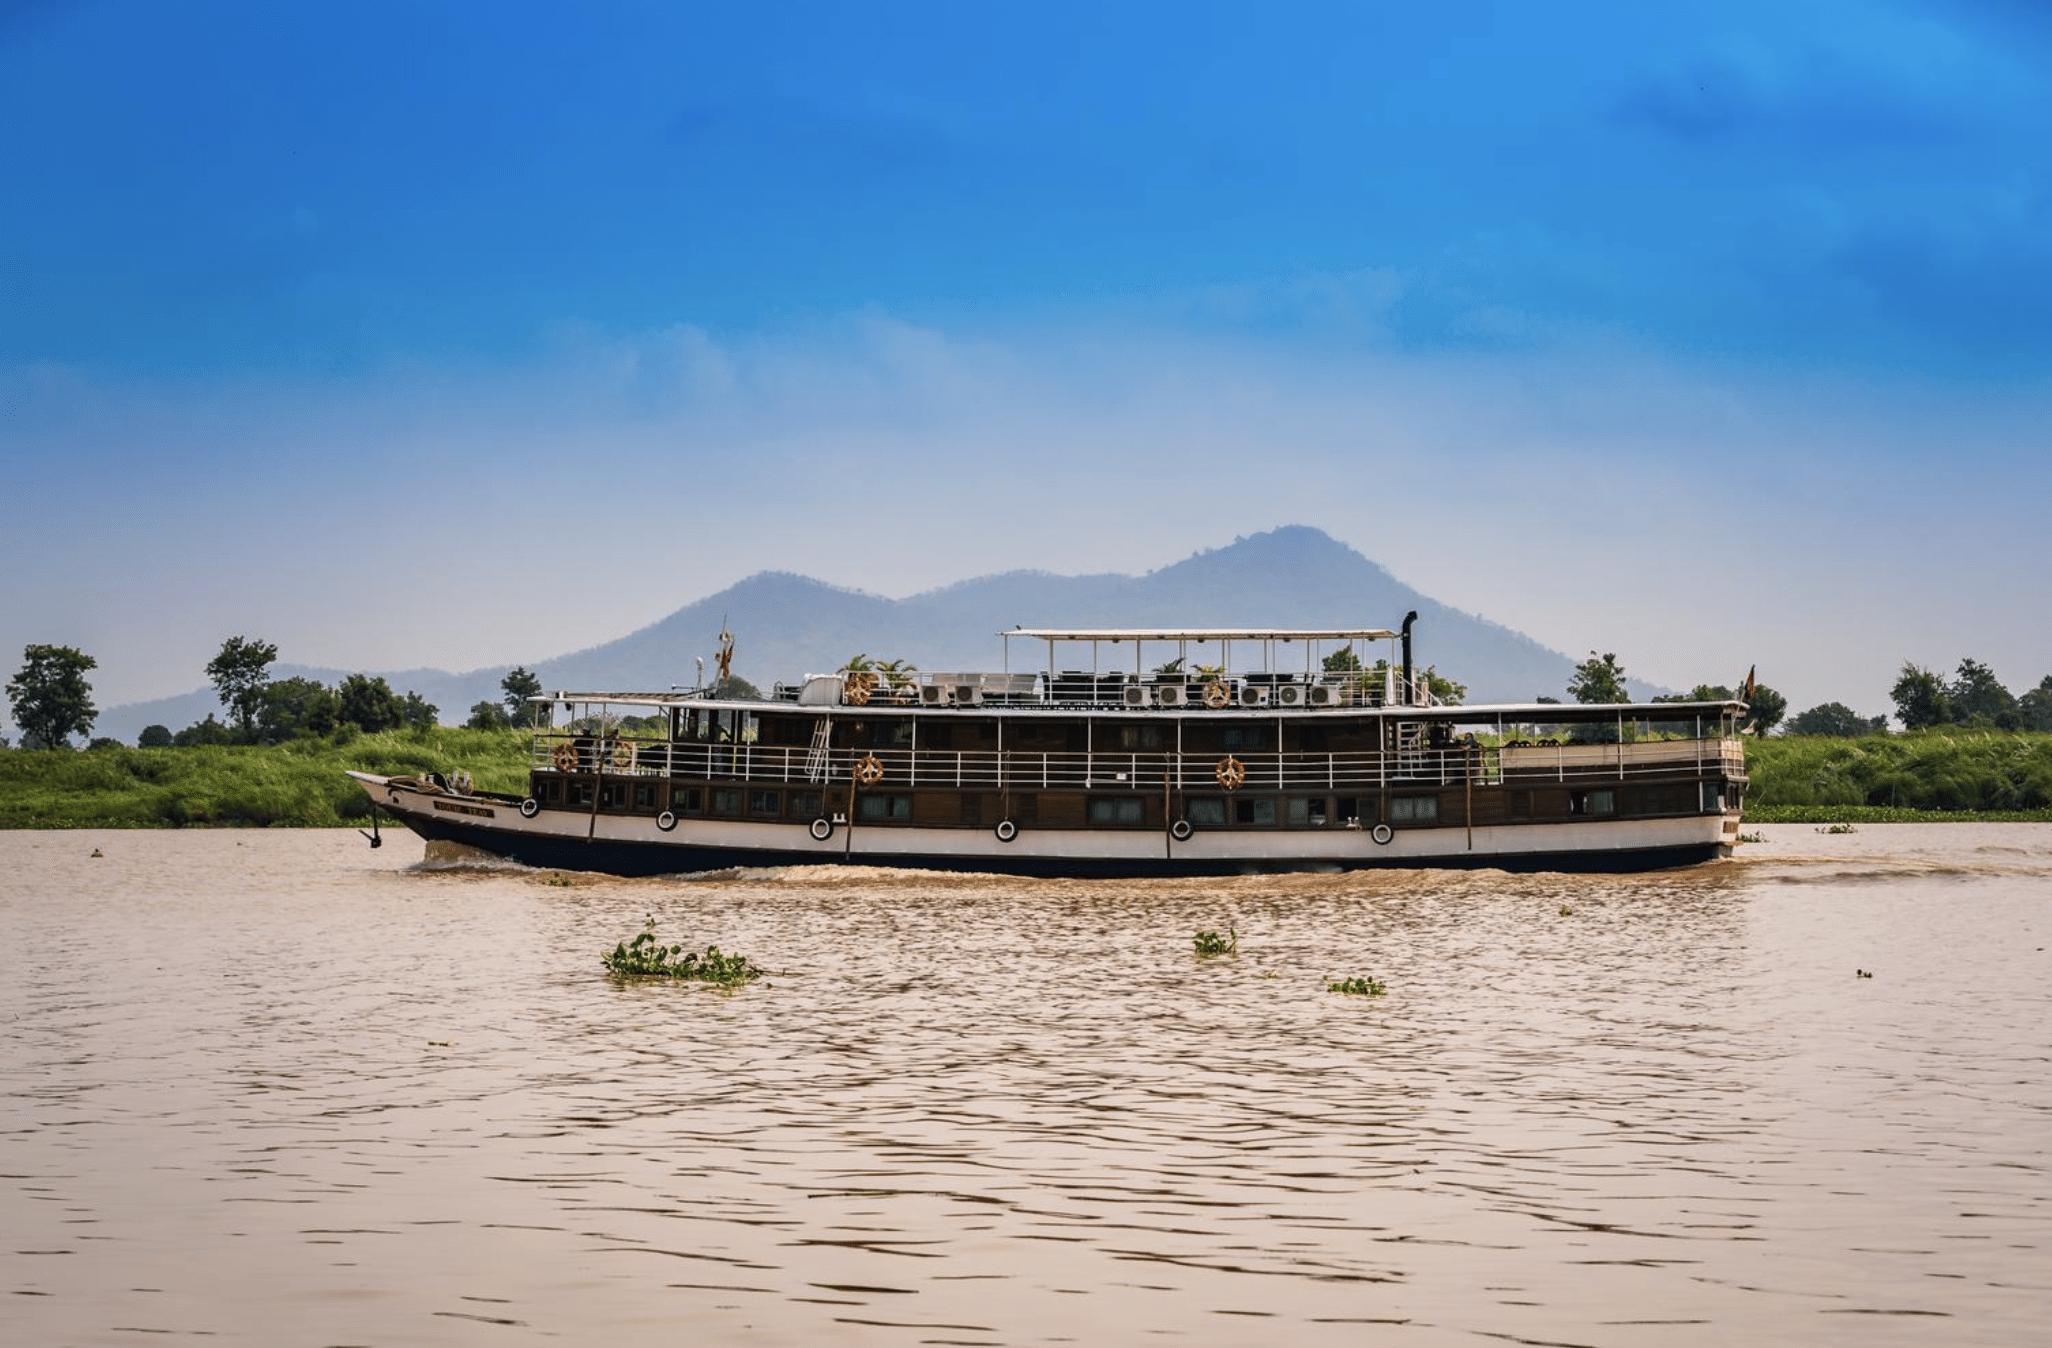 Mekong River Cruise Vessel